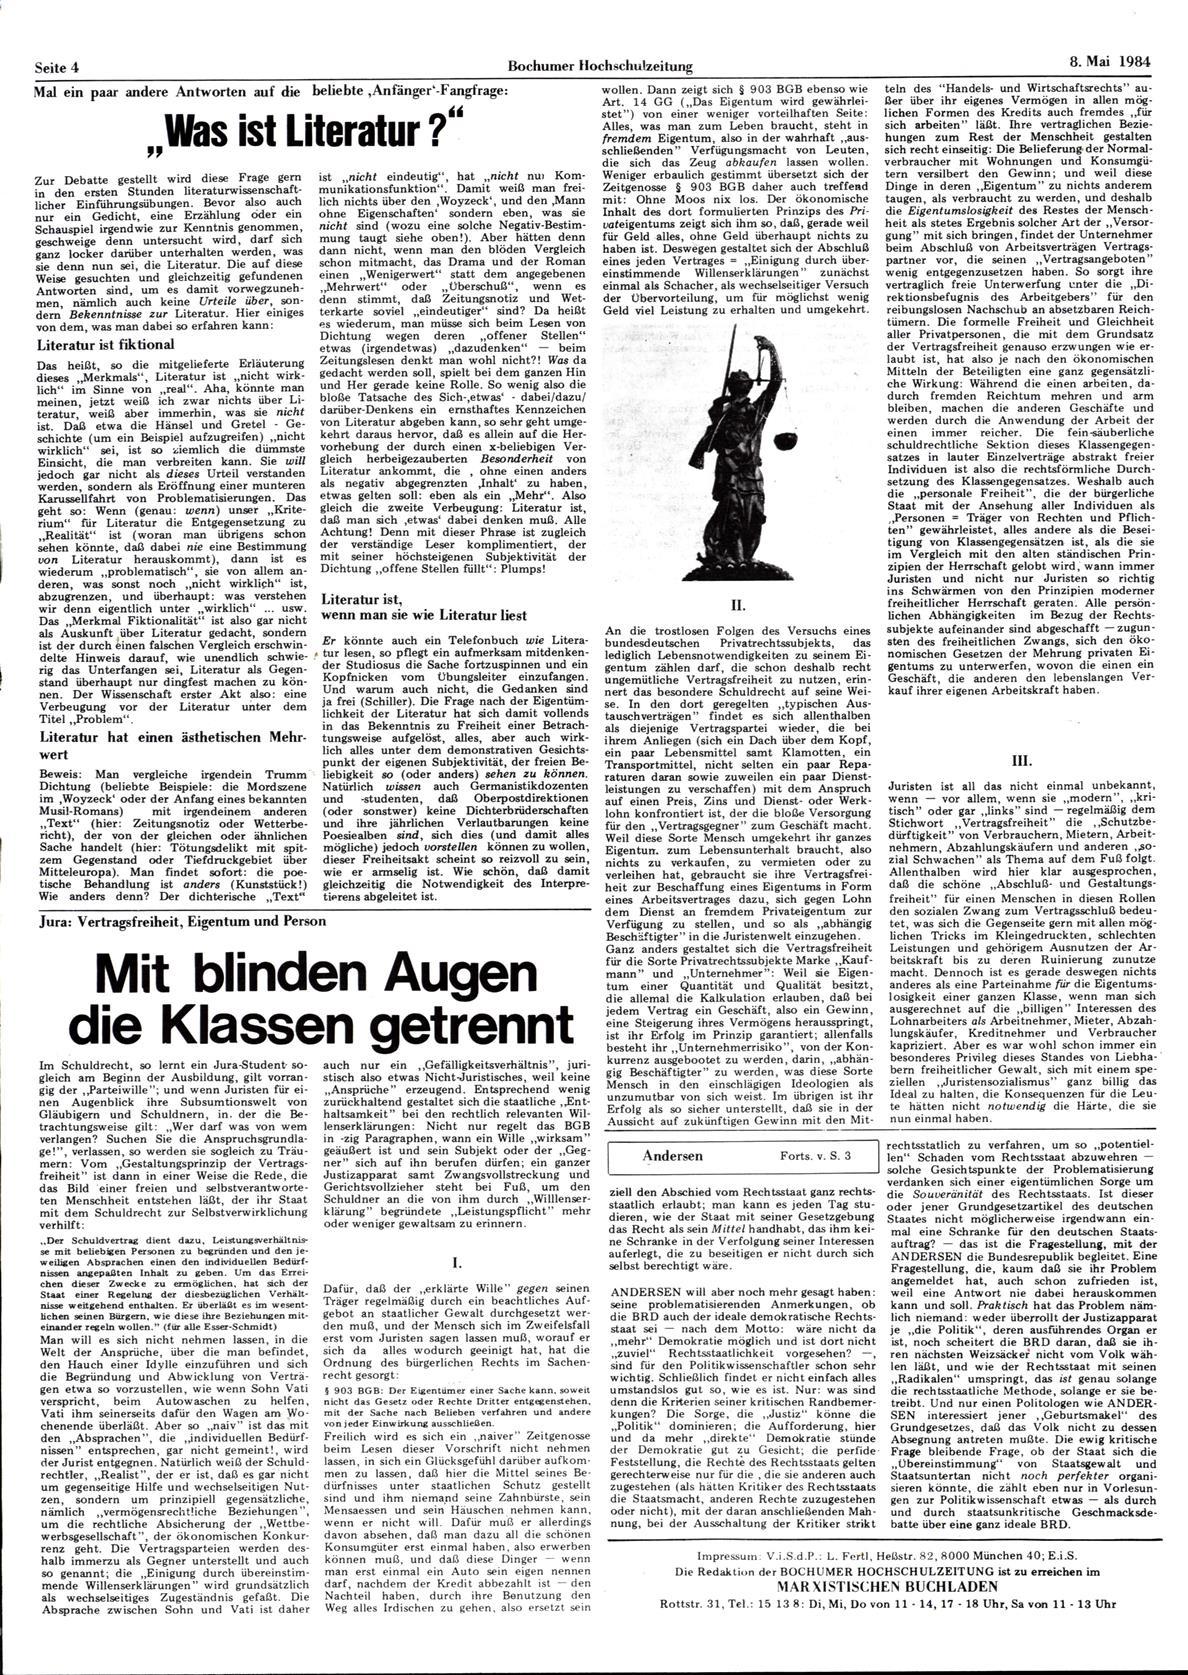 Bochum_BHZ_19840508_091_004